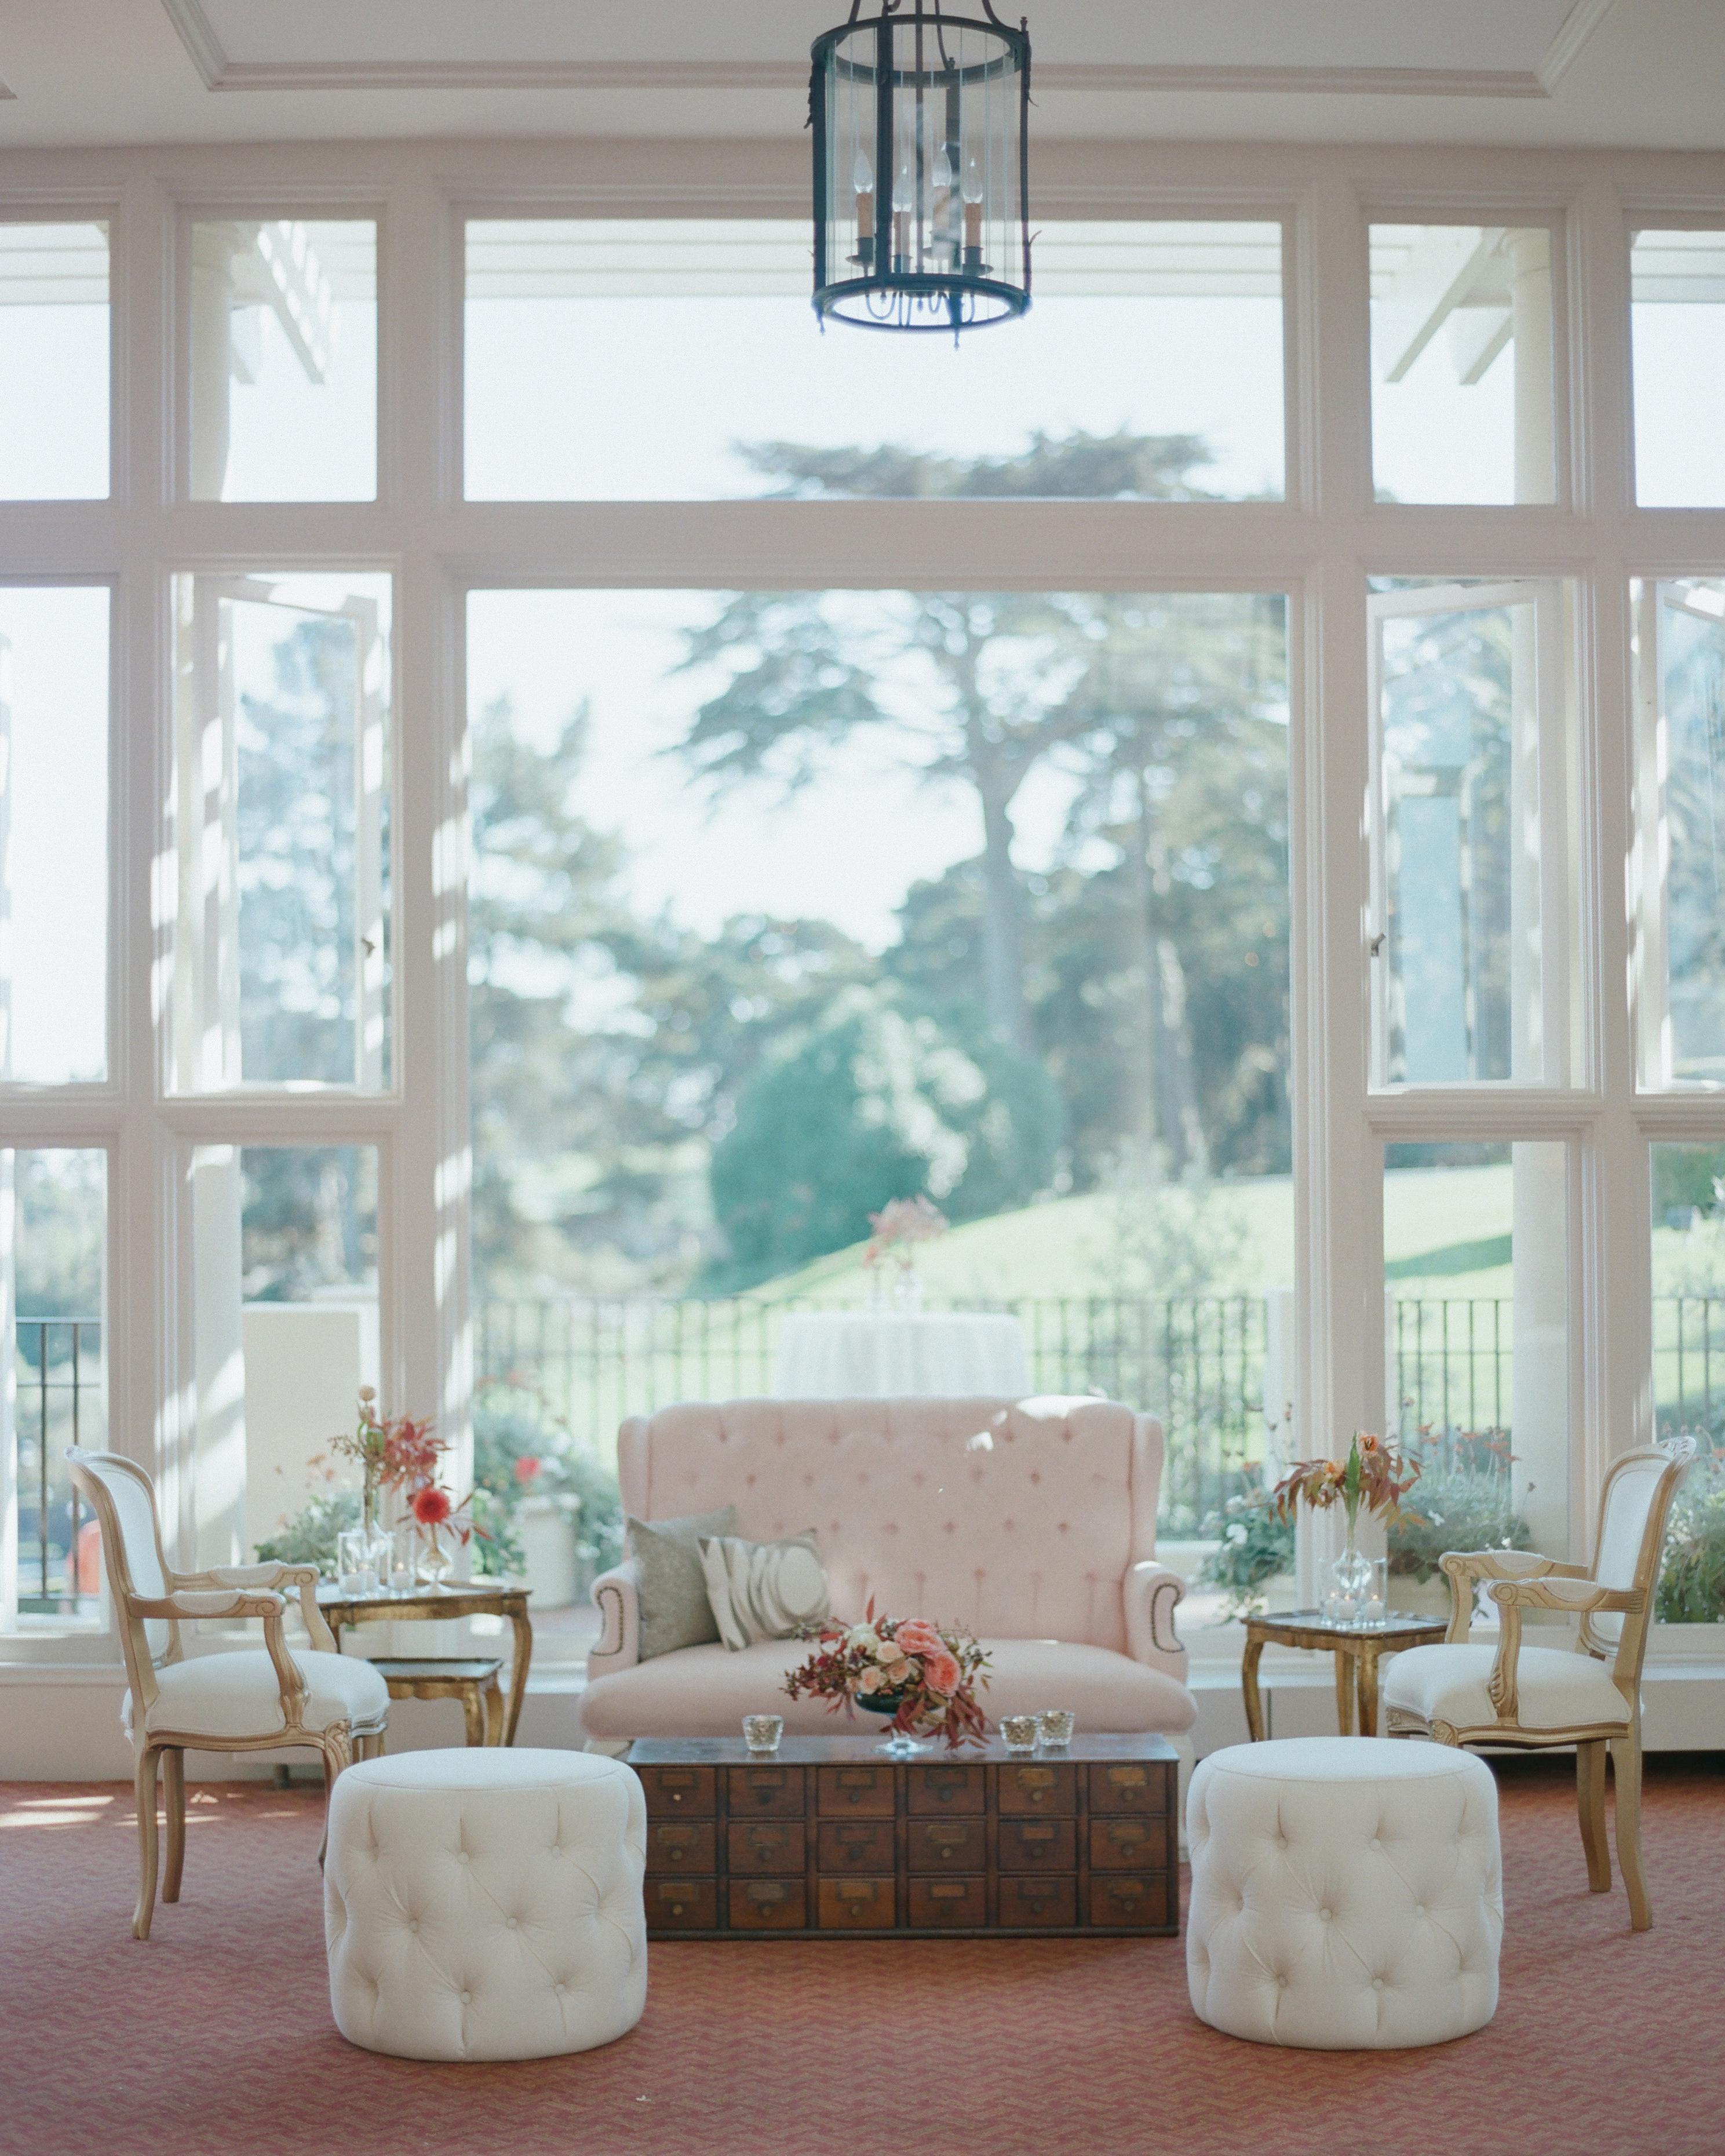 marianne-ian-wedding-lounge-0414.jpg